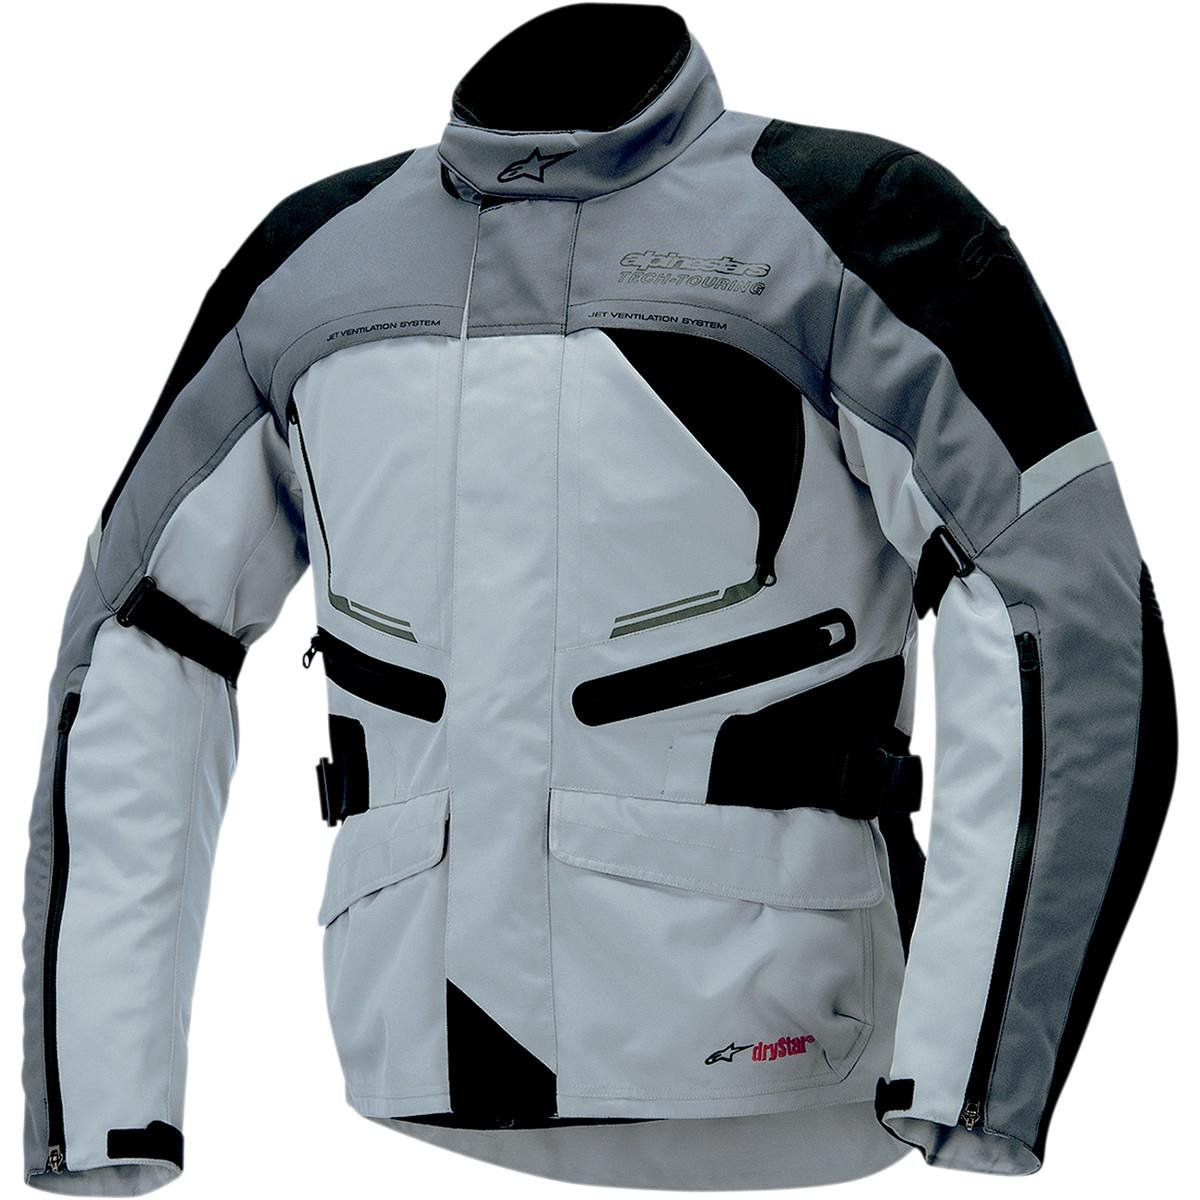 Distinct Name: Black//Light Gray//Dark Gray 3204014-9211-3X Apparel Material: Textile Primary Color: Gray Gender: Mens//Unisex Size: 3XL Alpinestars Valparaiso Drystar Jacket